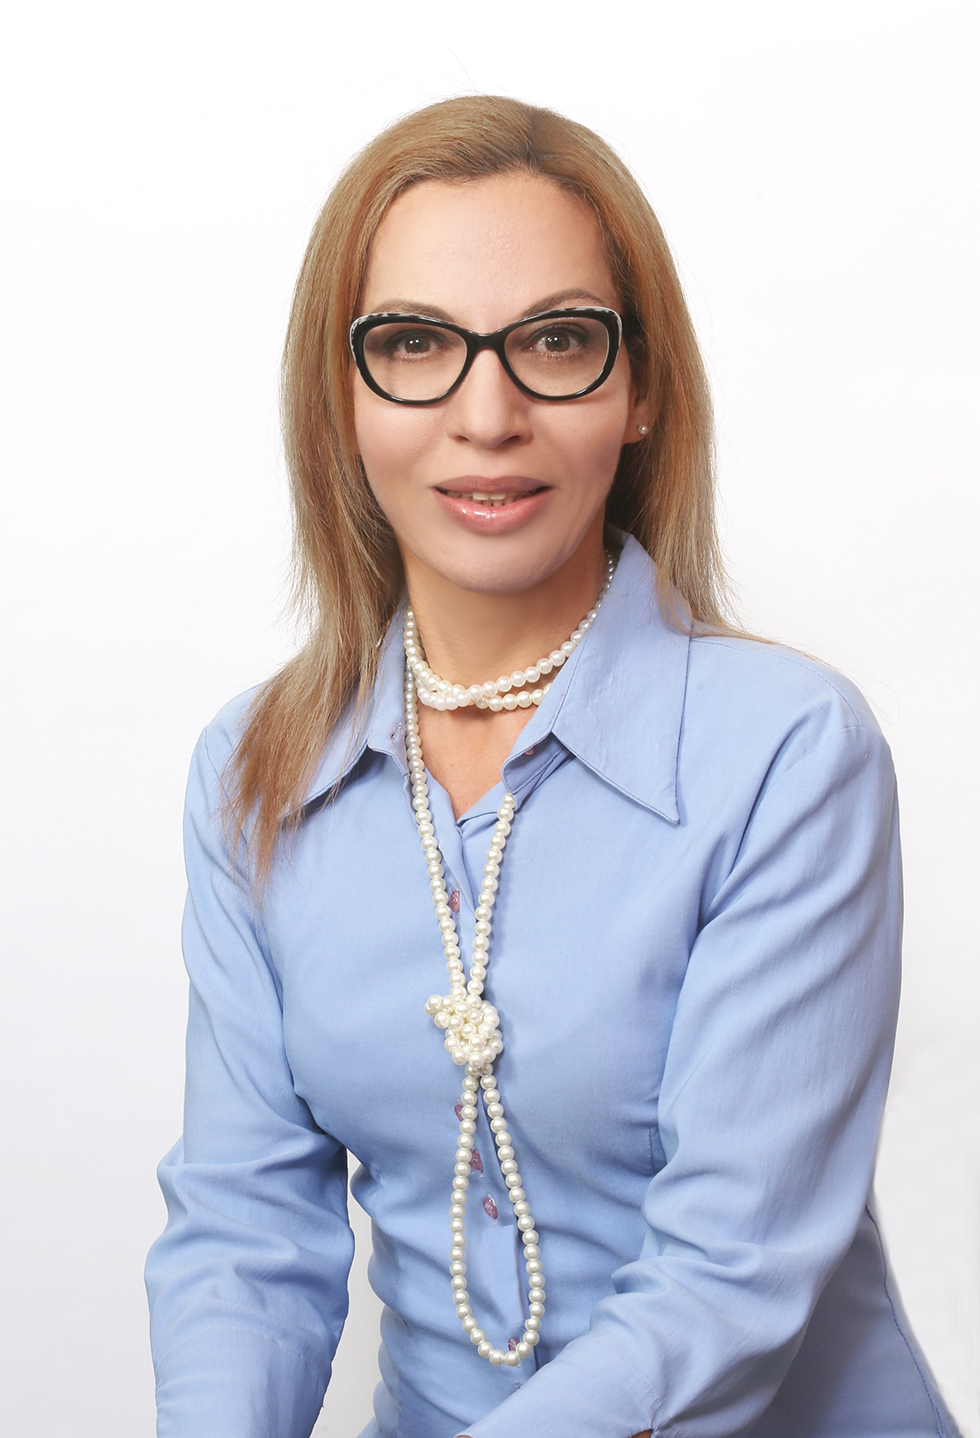 שרון אברמוביץ-וולשטיין